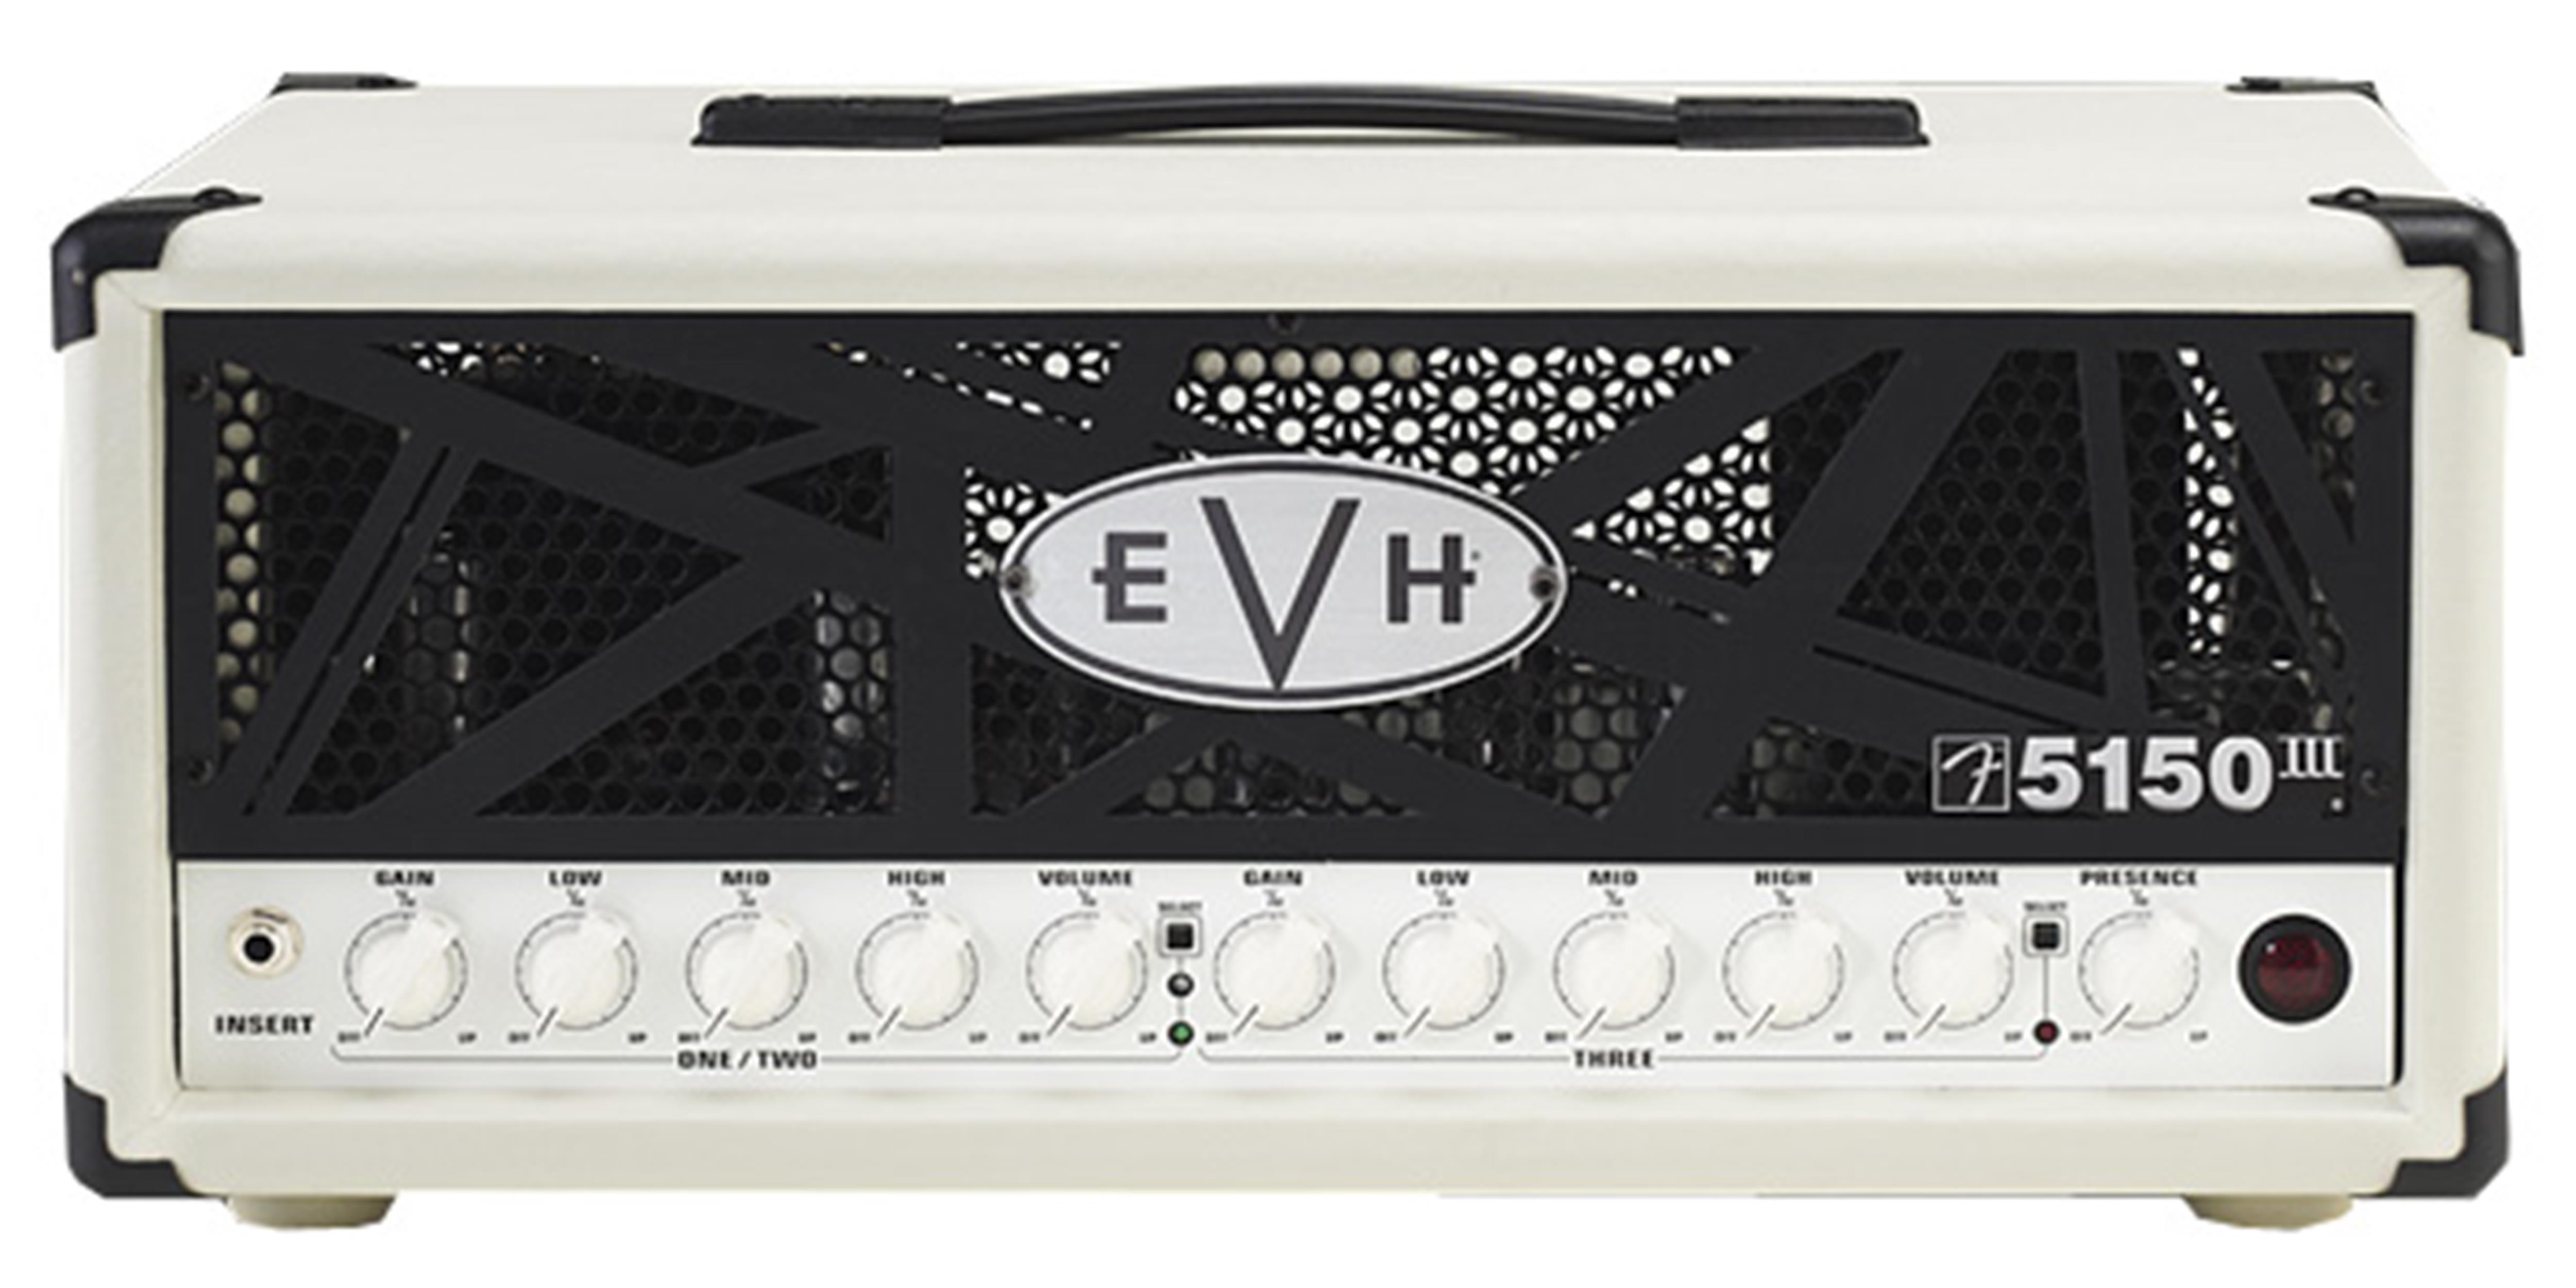 EVH 5150 3 50 WATT IVORY WHITE